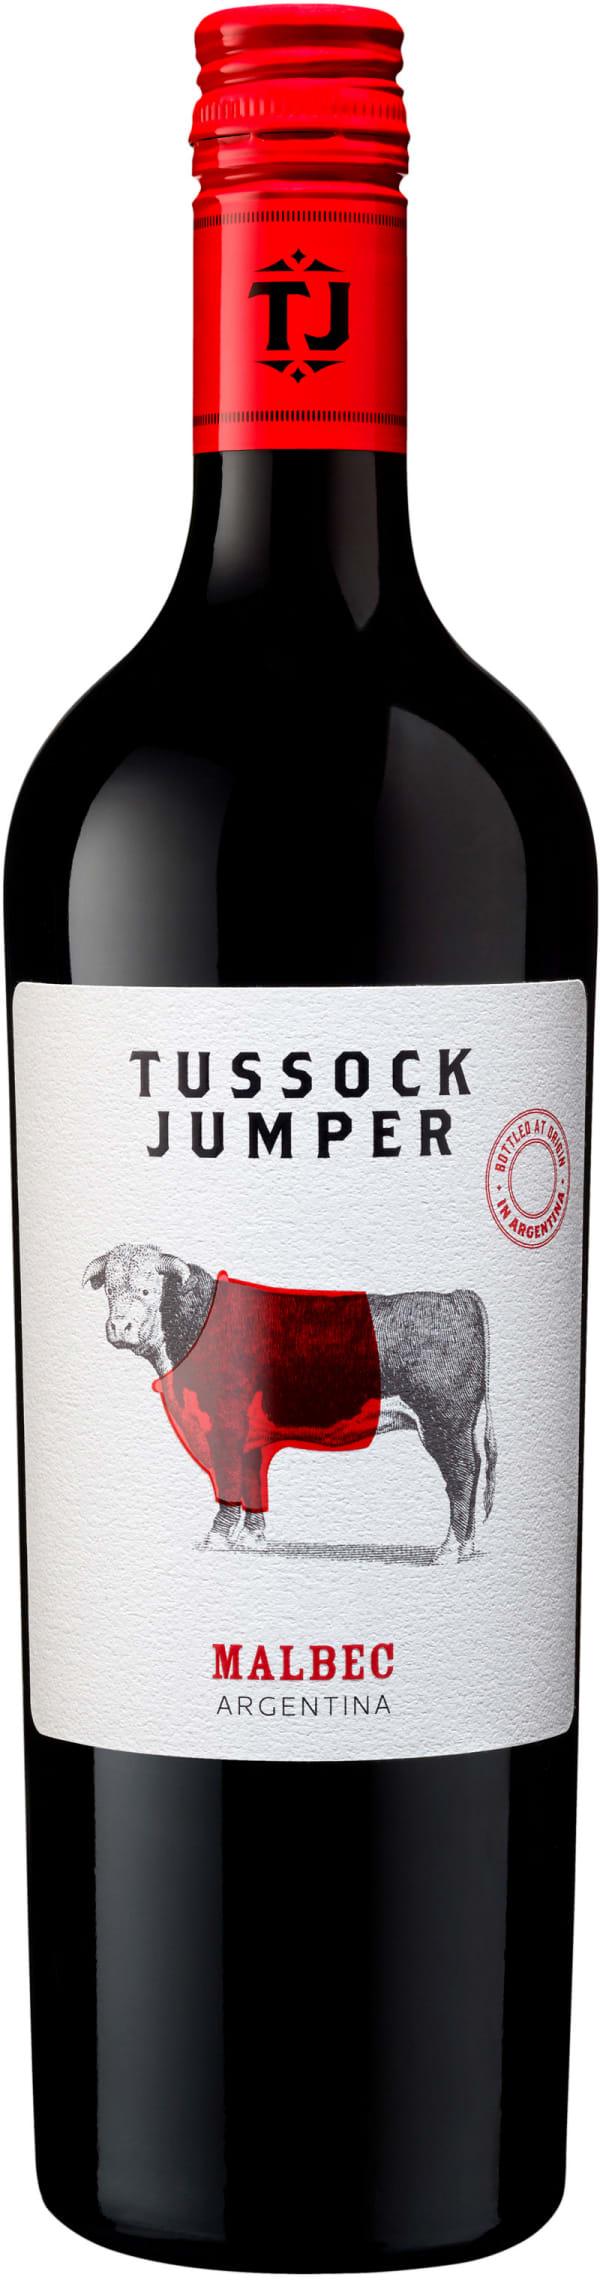 Tussock Jumper Malbec 2020